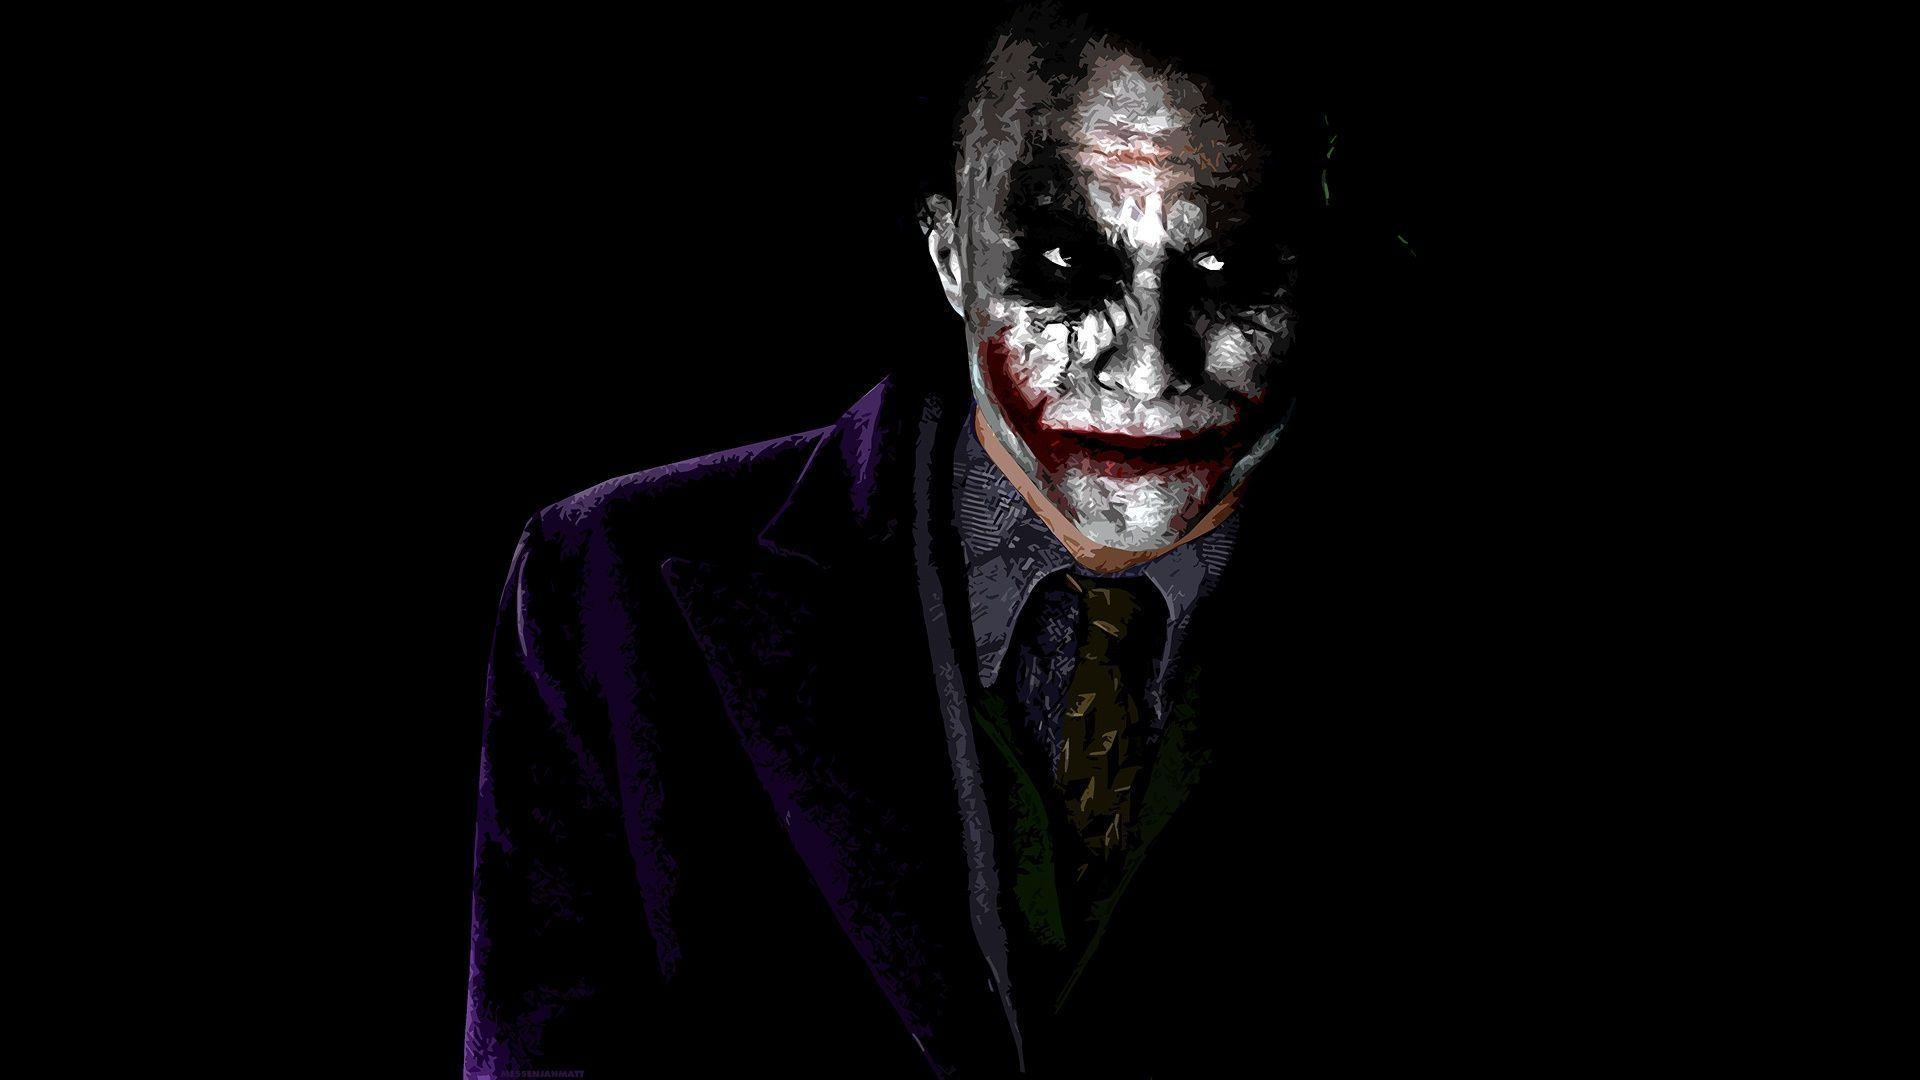 The Joker Wallpaper Hd Wide 1920x1080PX 1553